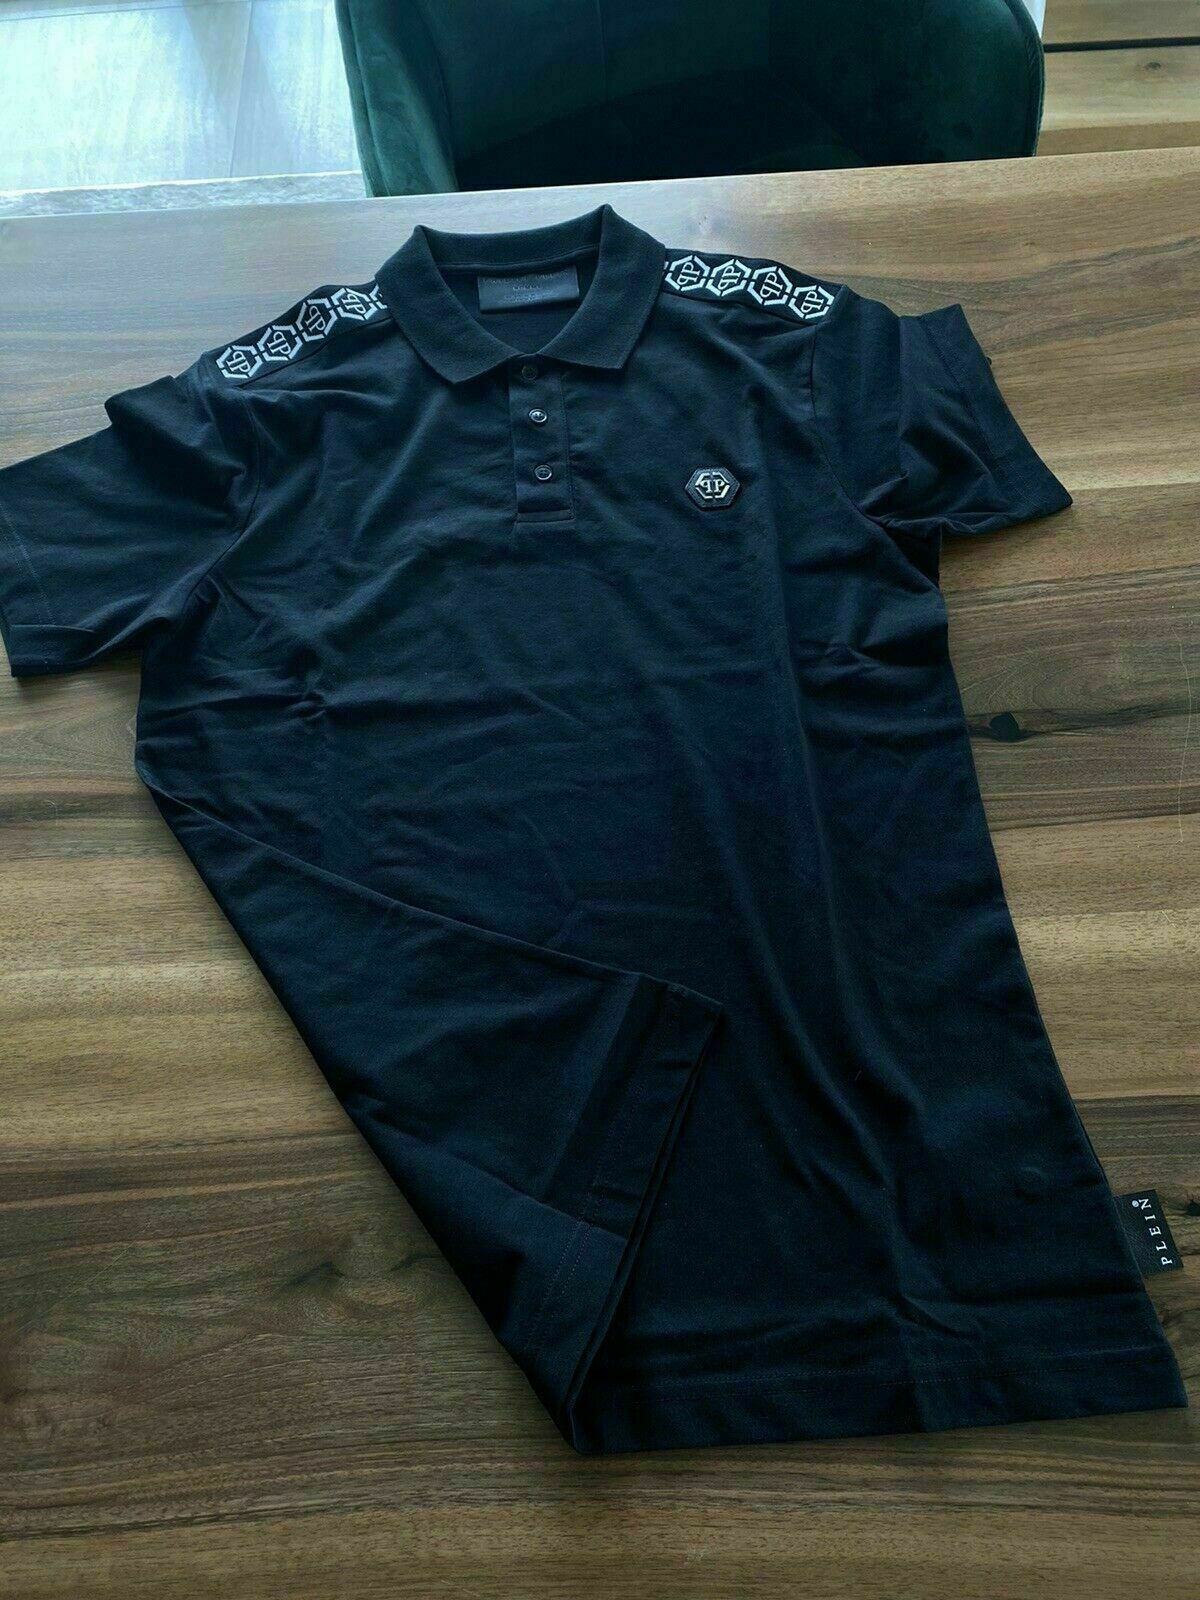 Philipp Plein New Season Iconic Cult Tape Polo Shirt Polohemd Shirt T-shirt L